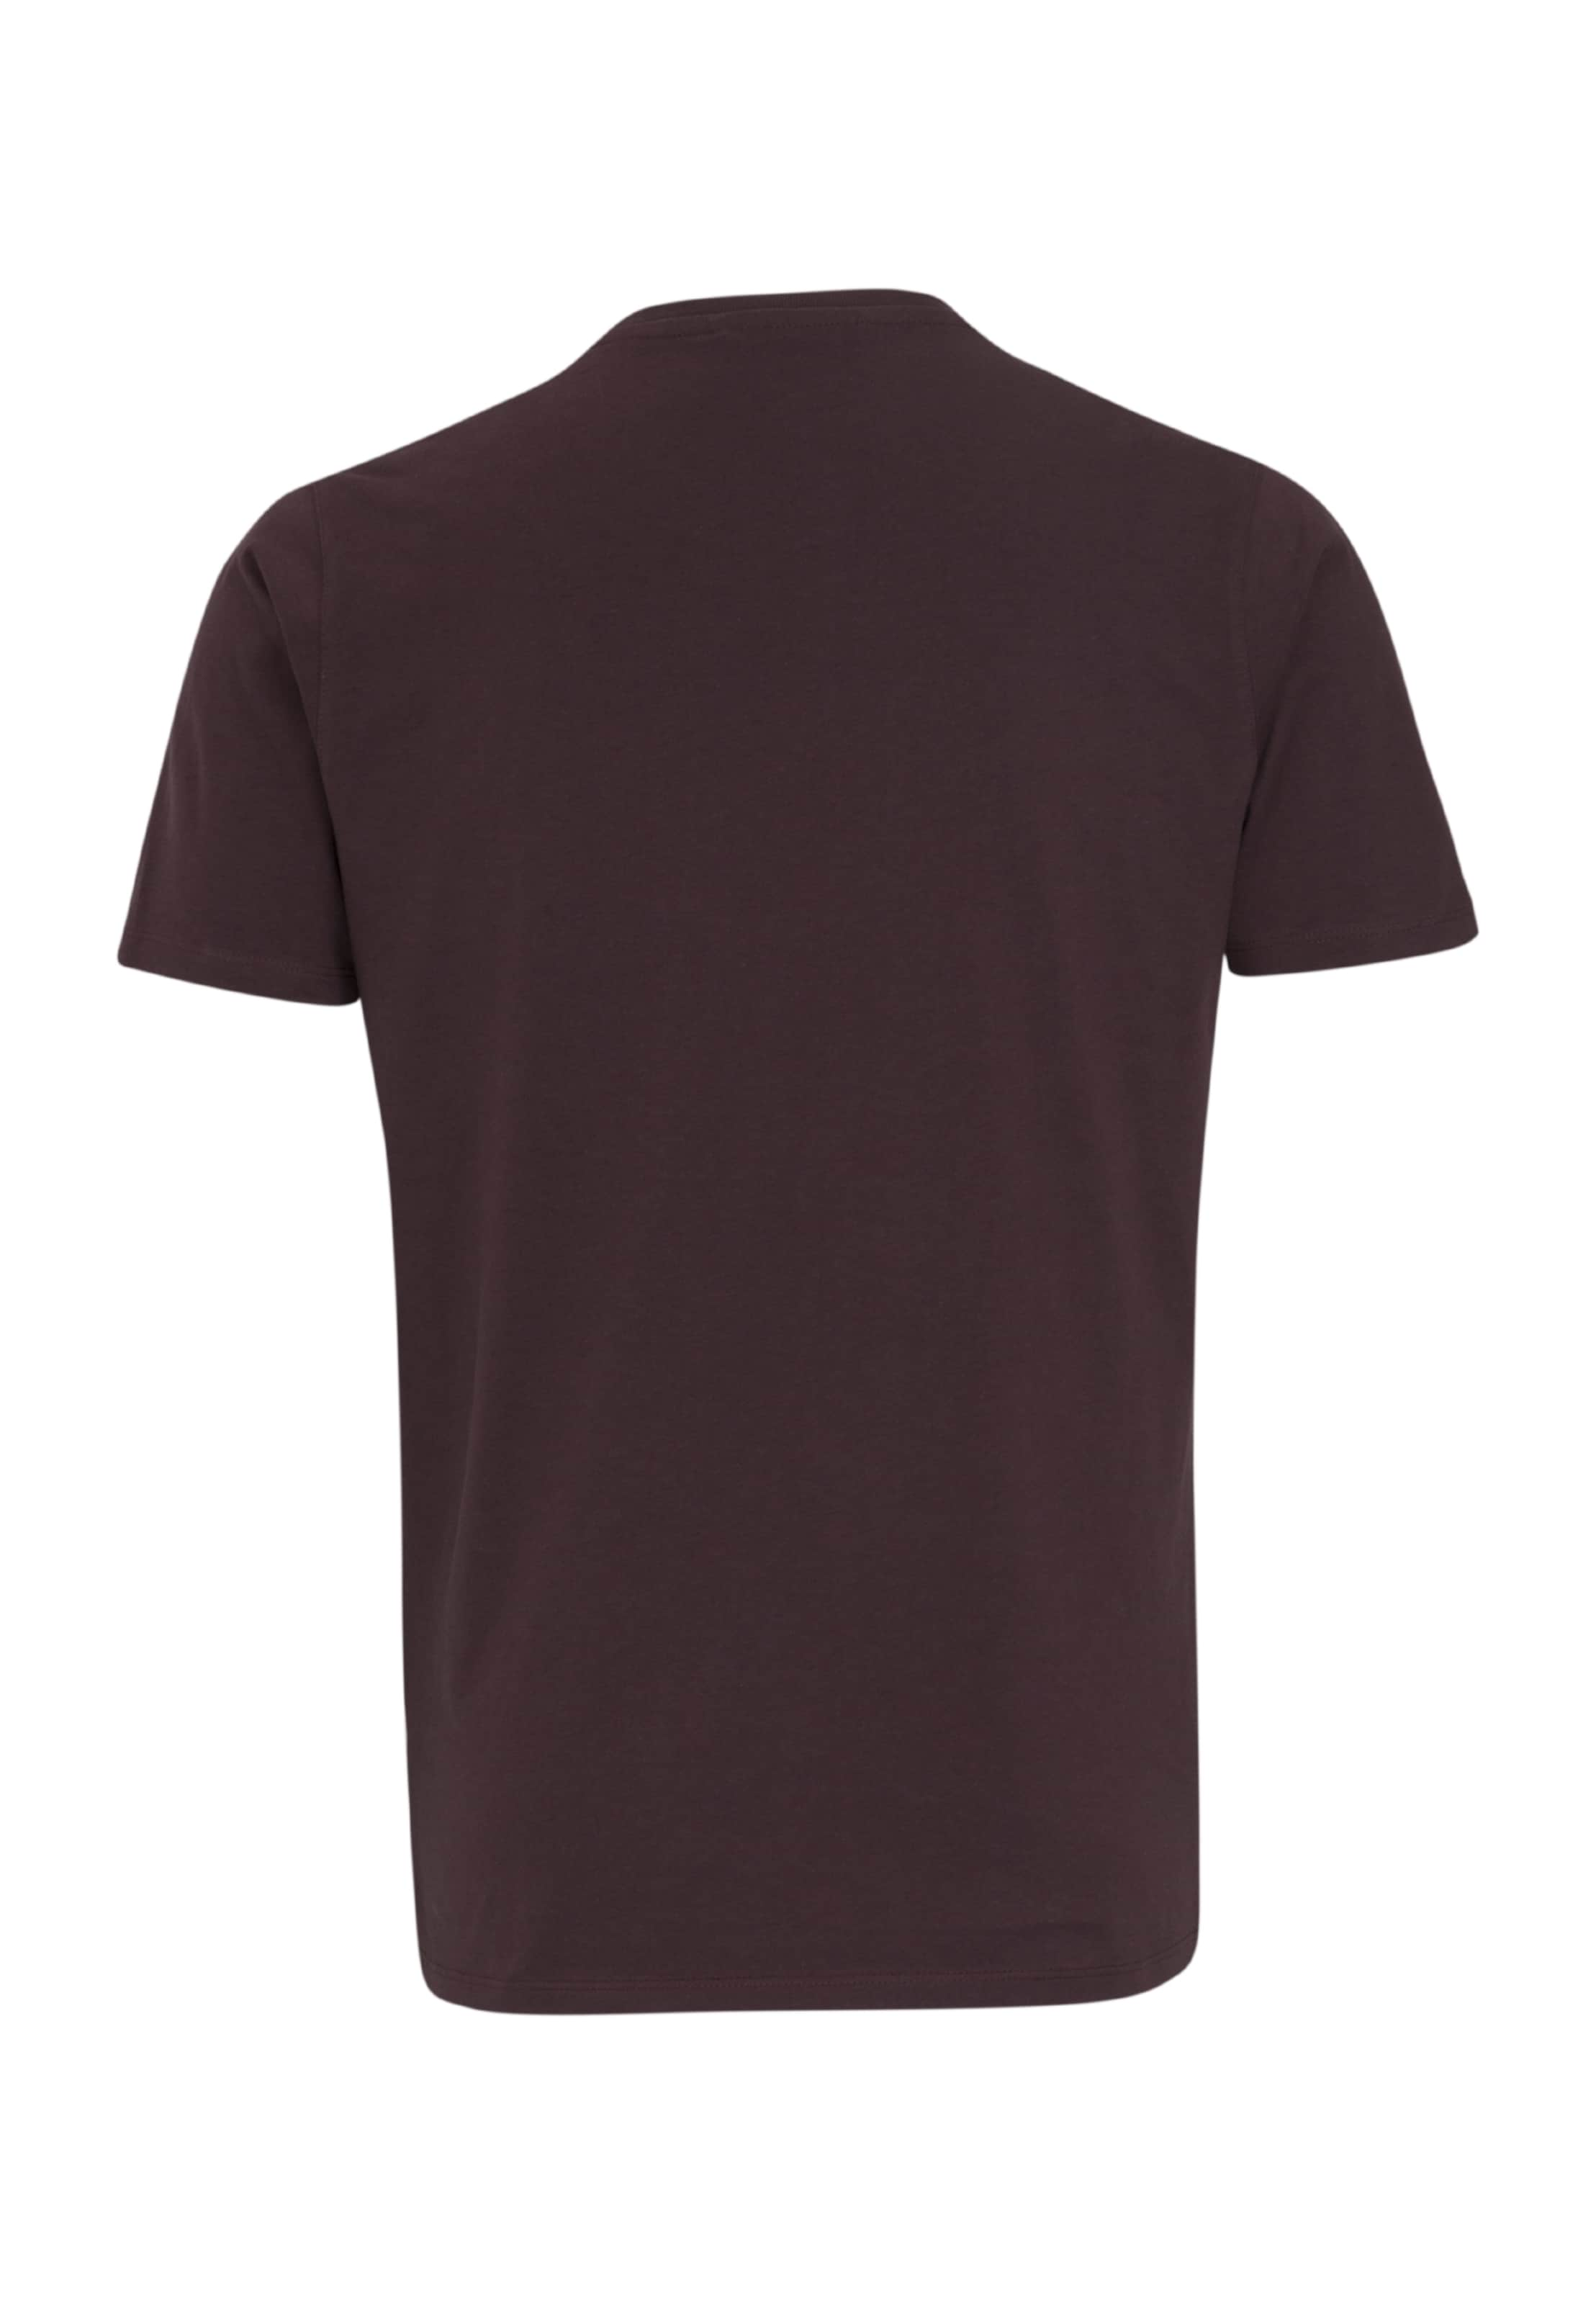 T Camel Active shirt Aubergine In Y76byfg